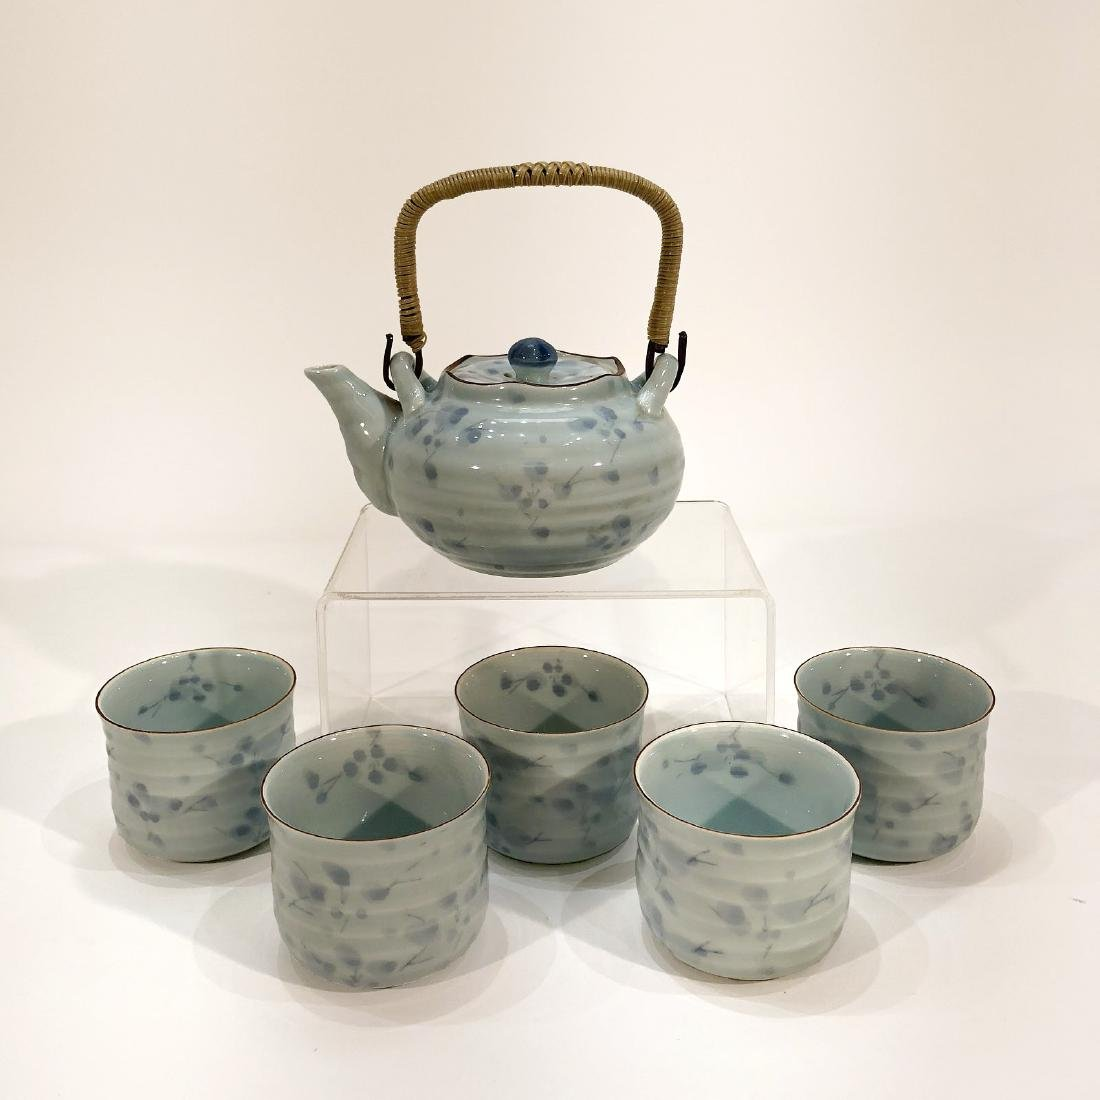 Japanese Tea Kettle & Cup Set